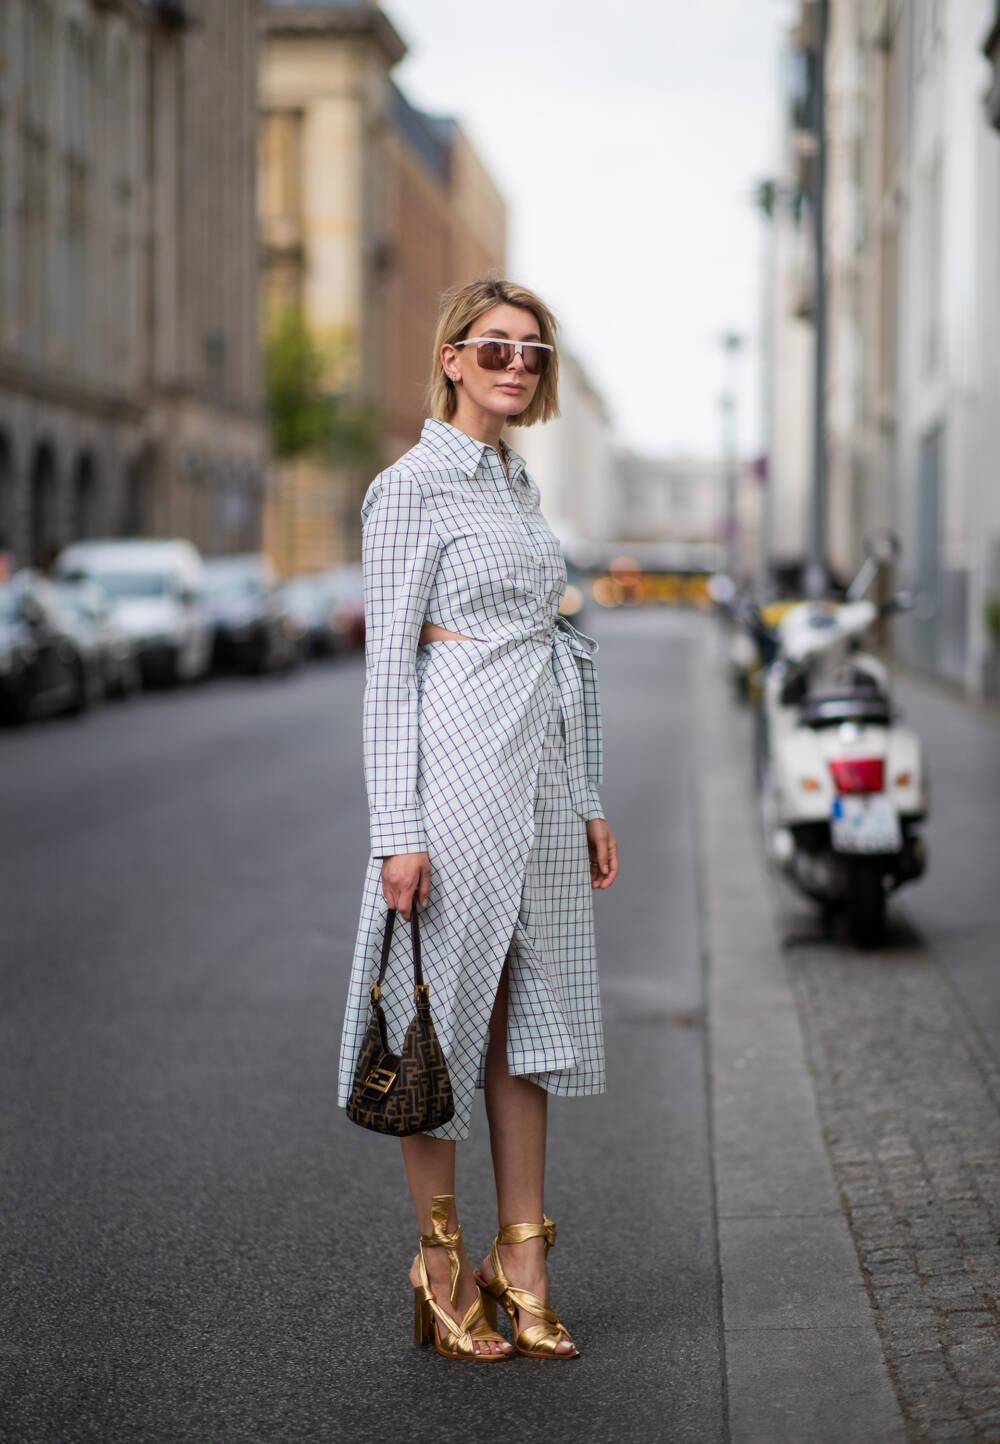 Bloggerin mit Hemdblusenkleid